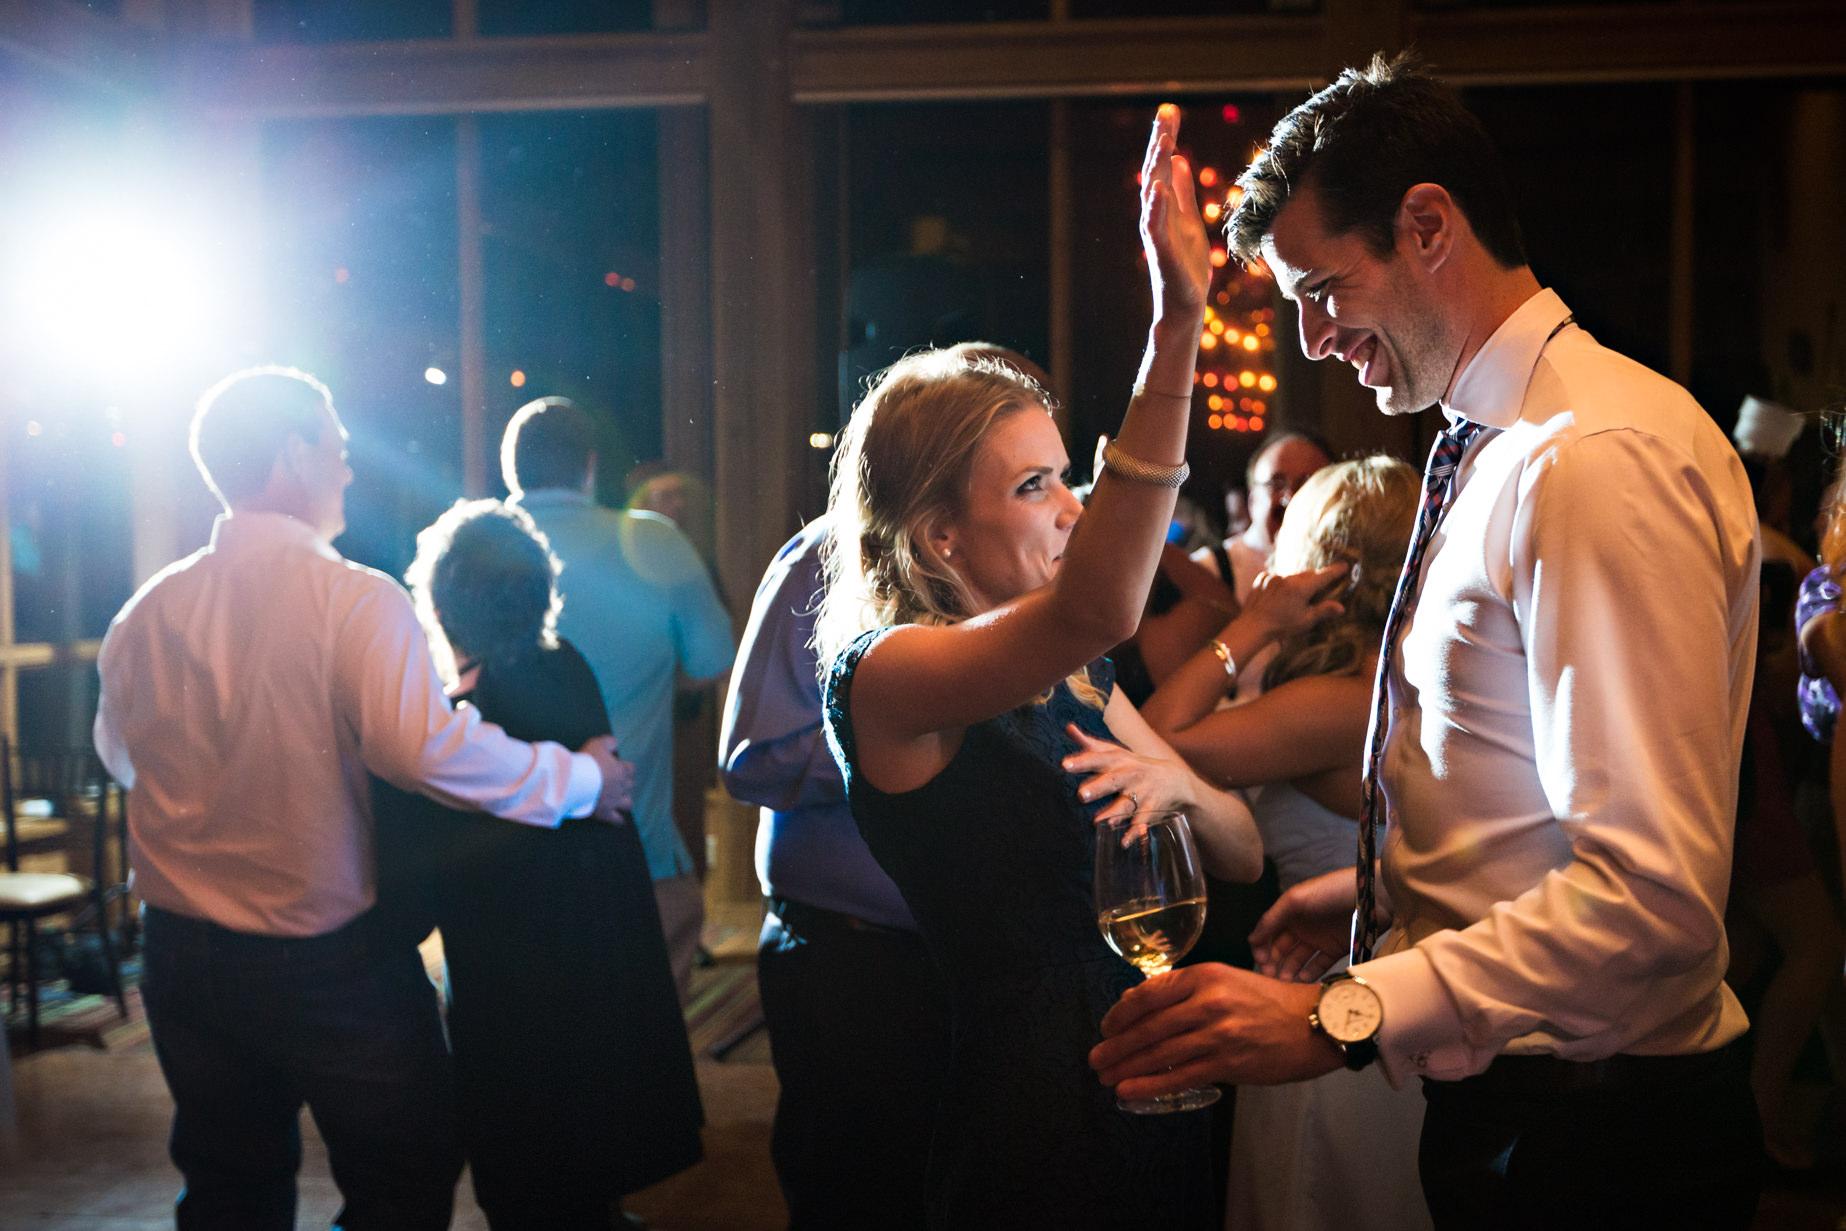 big-sky-resort-wedding-guests-dancing-huntley-dining-room.jpg